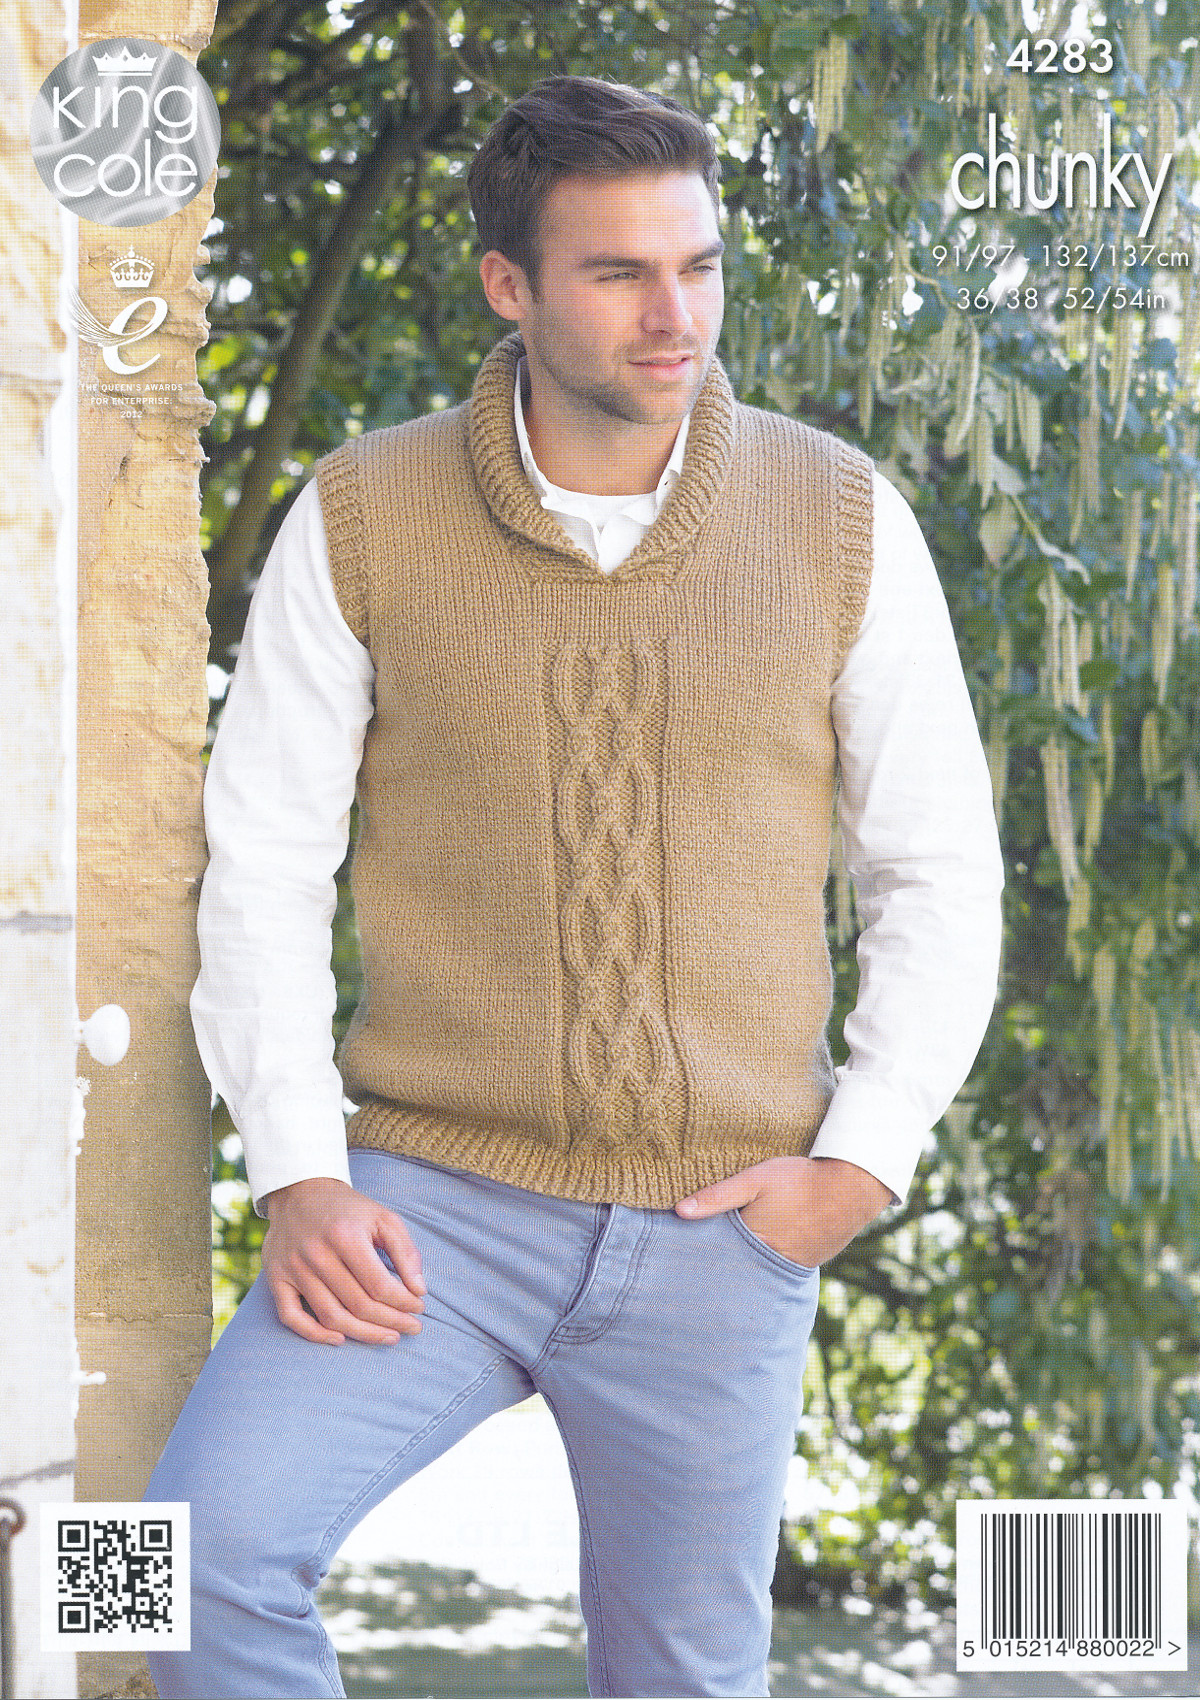 King Cole Knitting Pattern 3318 : Mens Chunky Knitting Pattern King Cole Cable Knit Sweater Jumper Slipover 428...